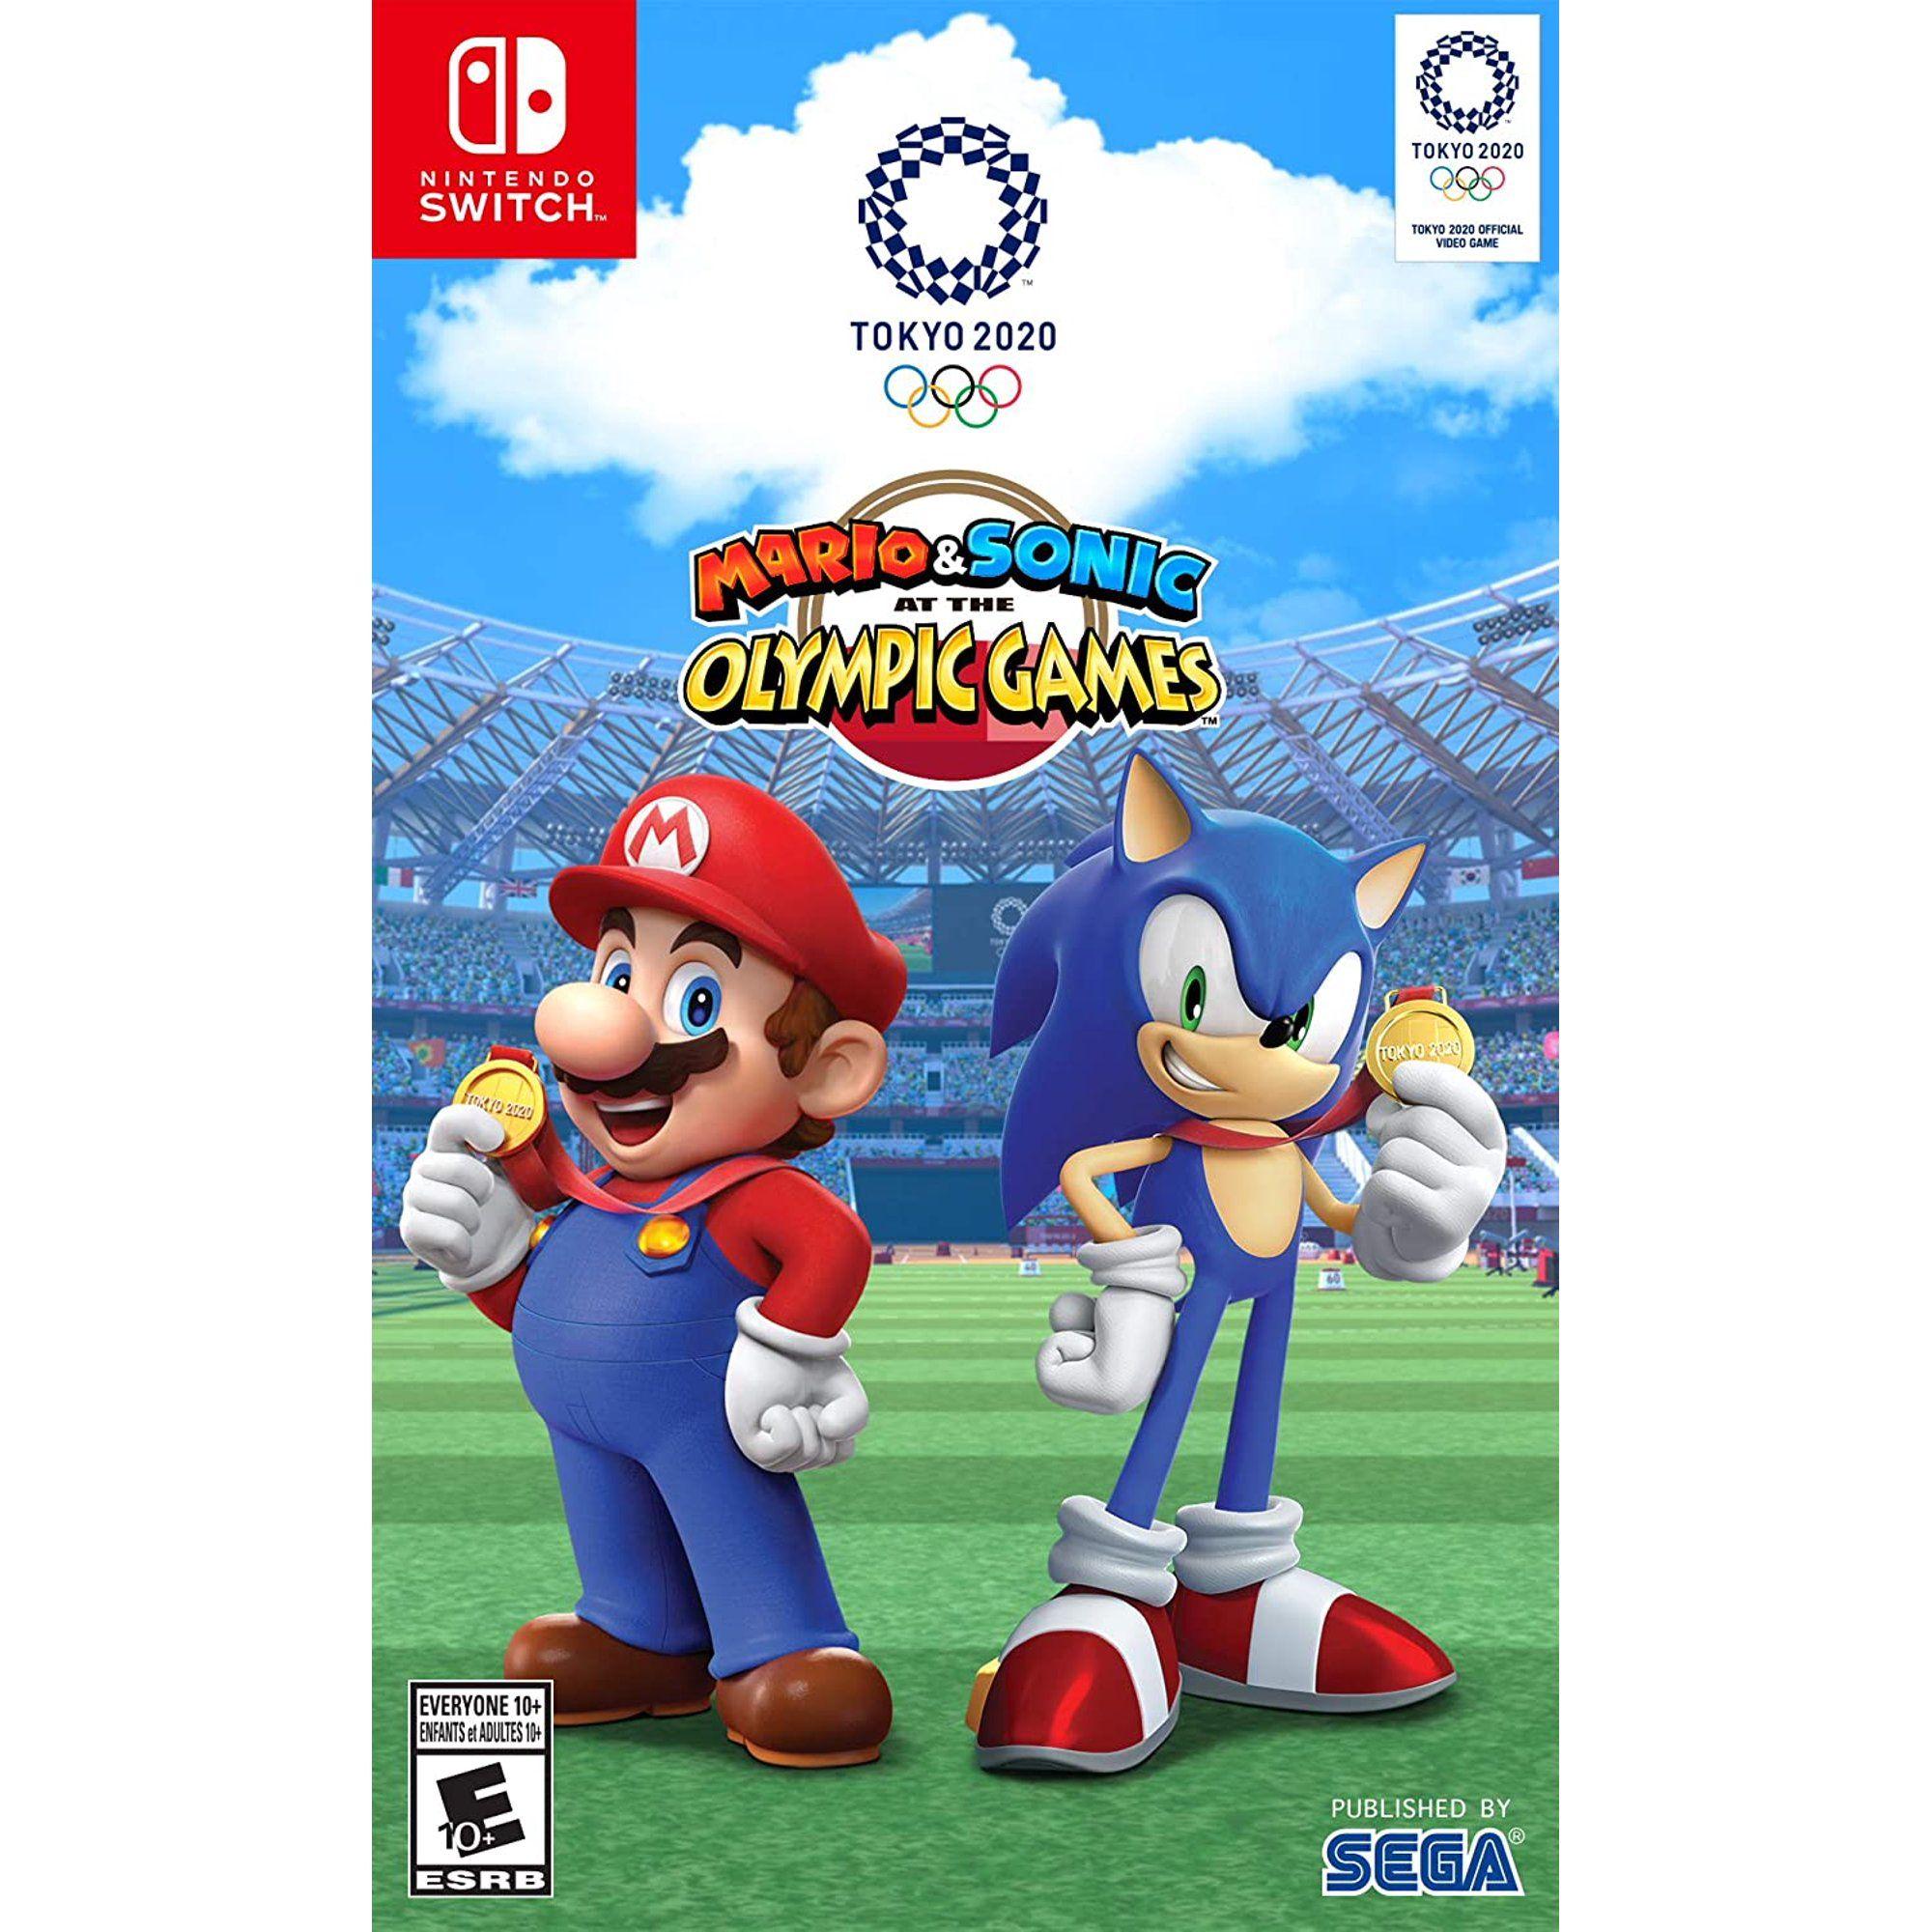 Mario Sonic At The Olympic Games Tokyo 2020 Sega Nintendo Switch 010086770094 Walmart Com In 2021 Nintendo Switch Games Mario Tokyo 2020